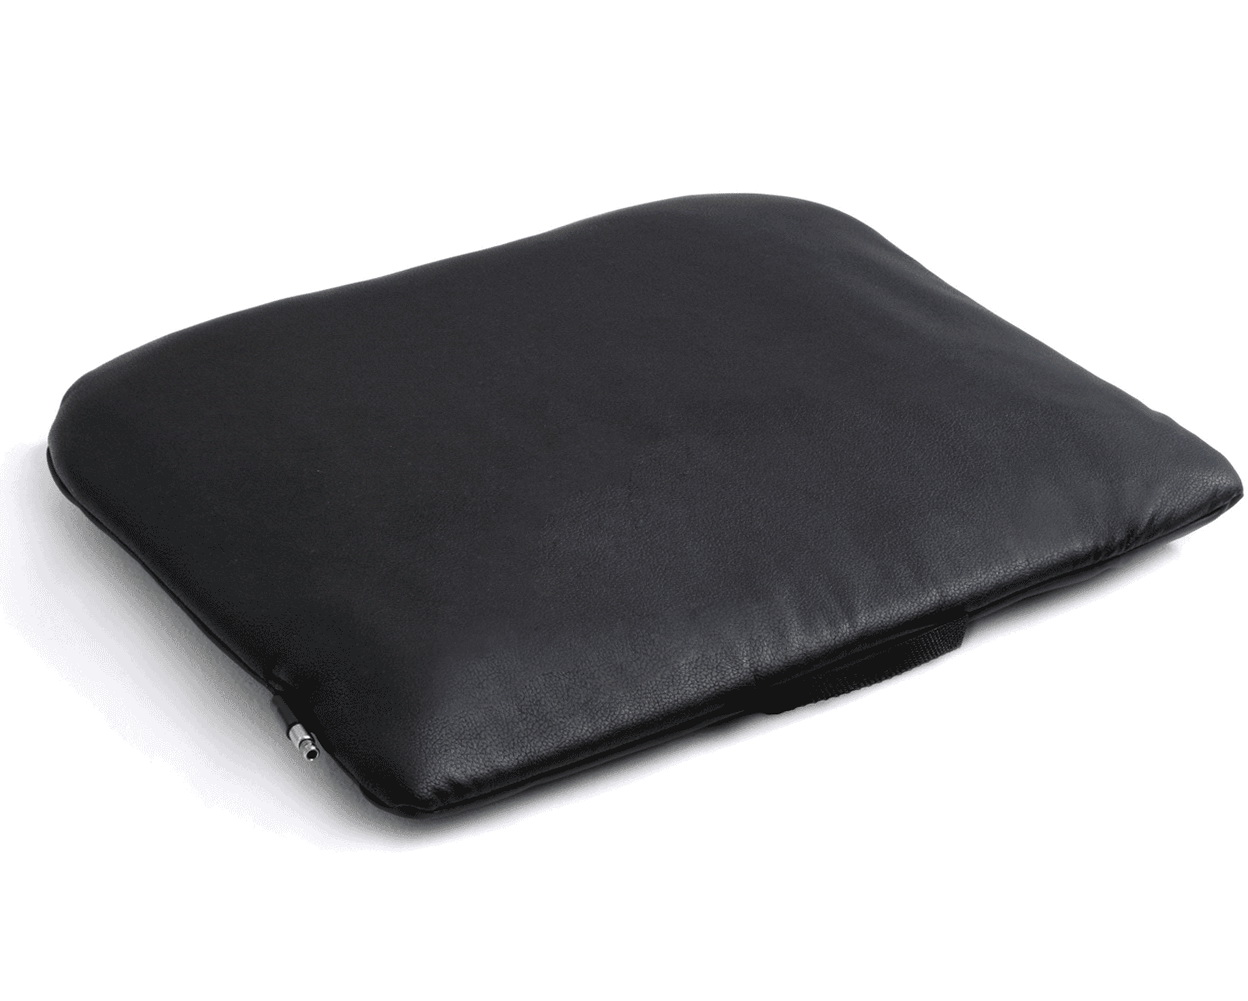 Tracked Air Cushion Vehicle